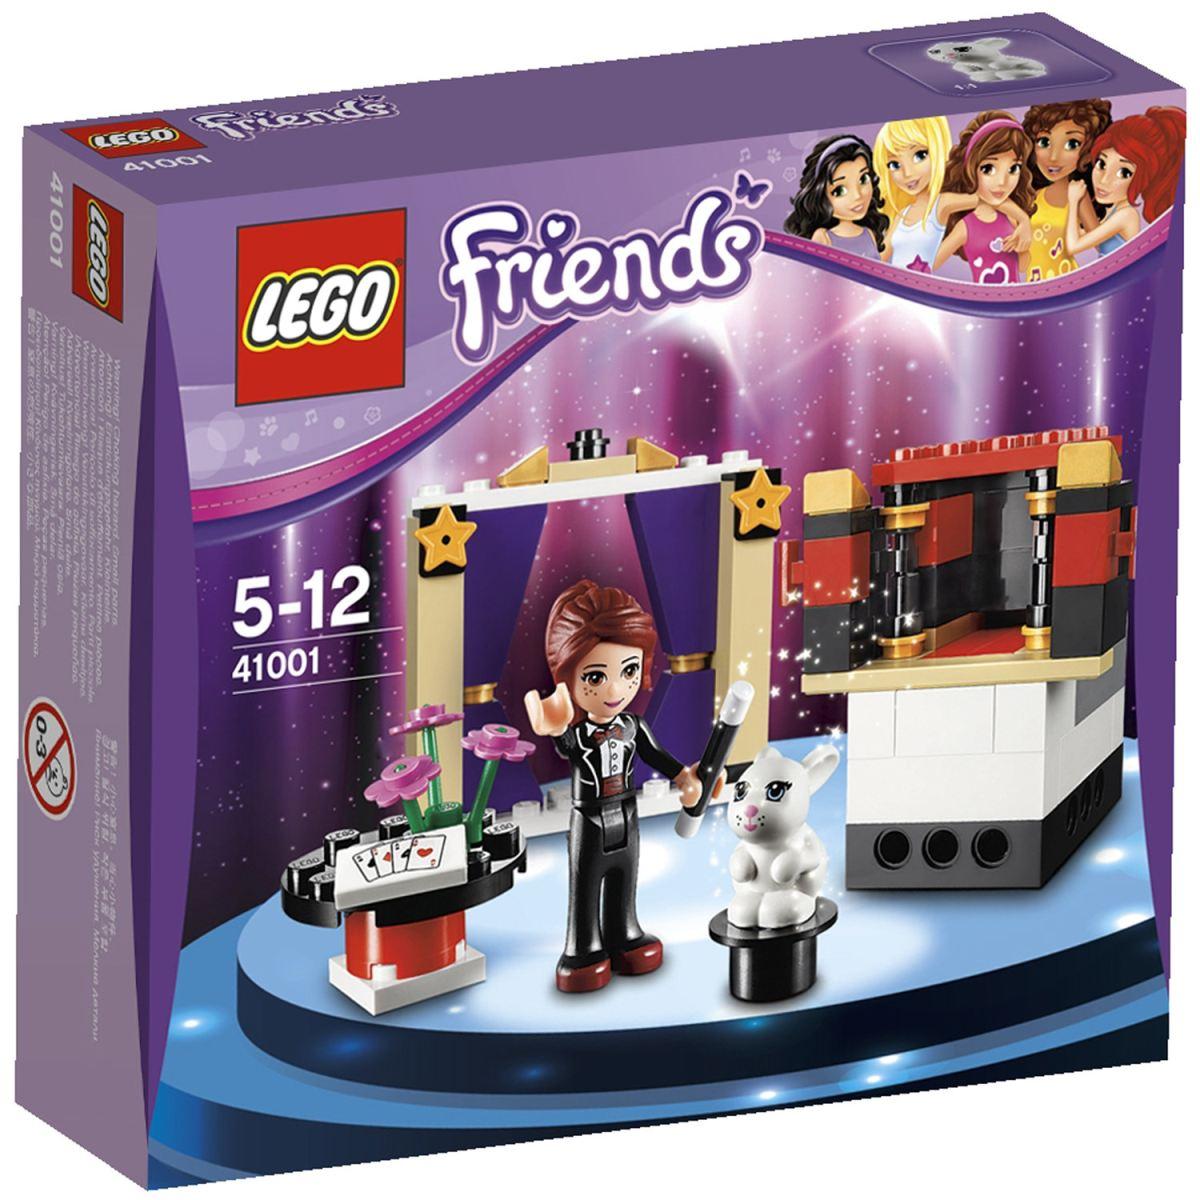 Đồ chơi LEGO 41001